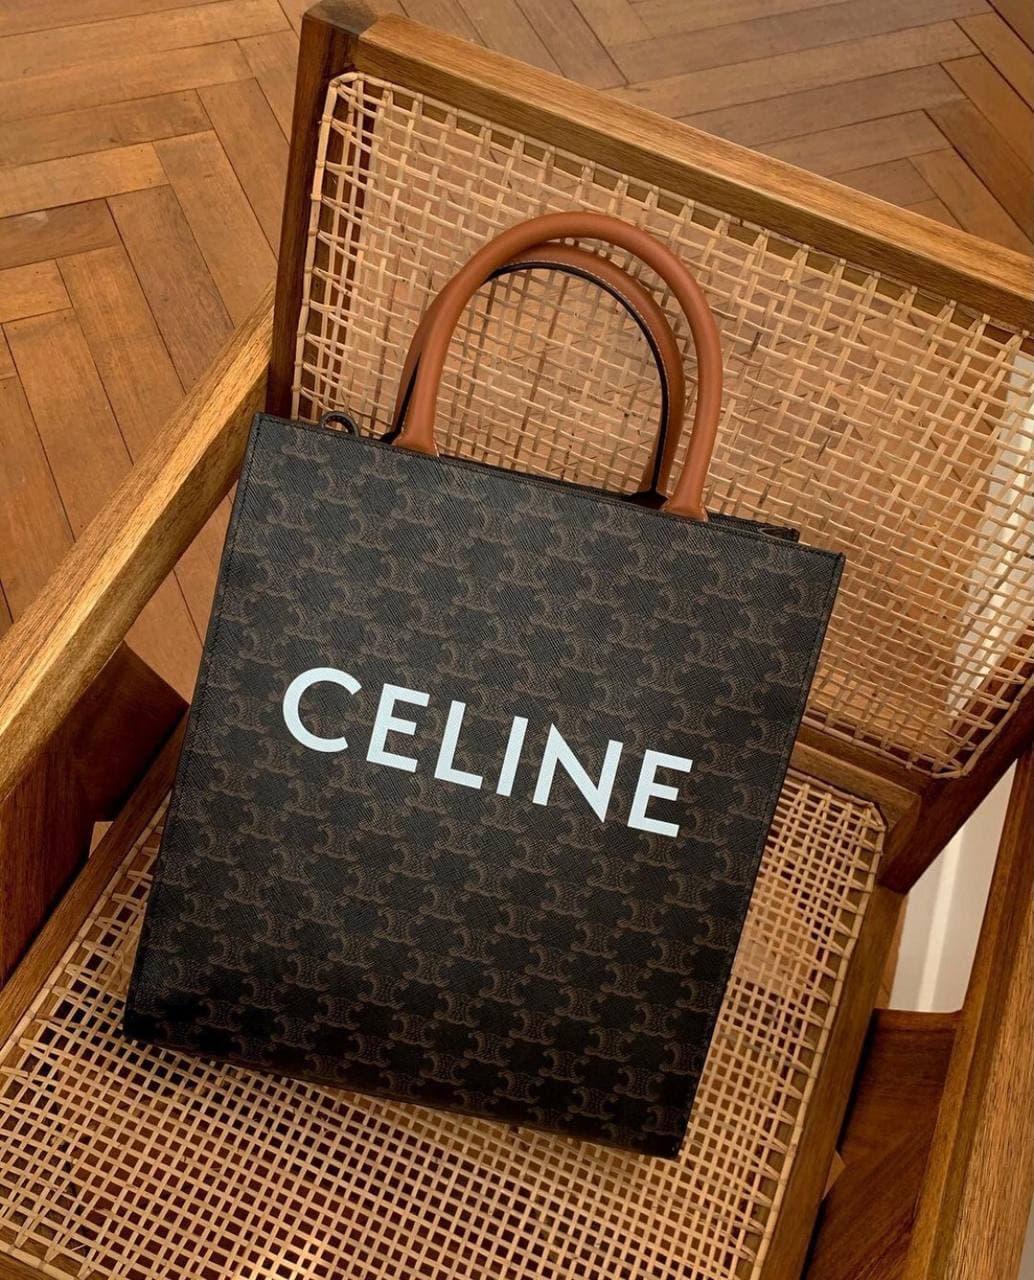 CELINE women's bag